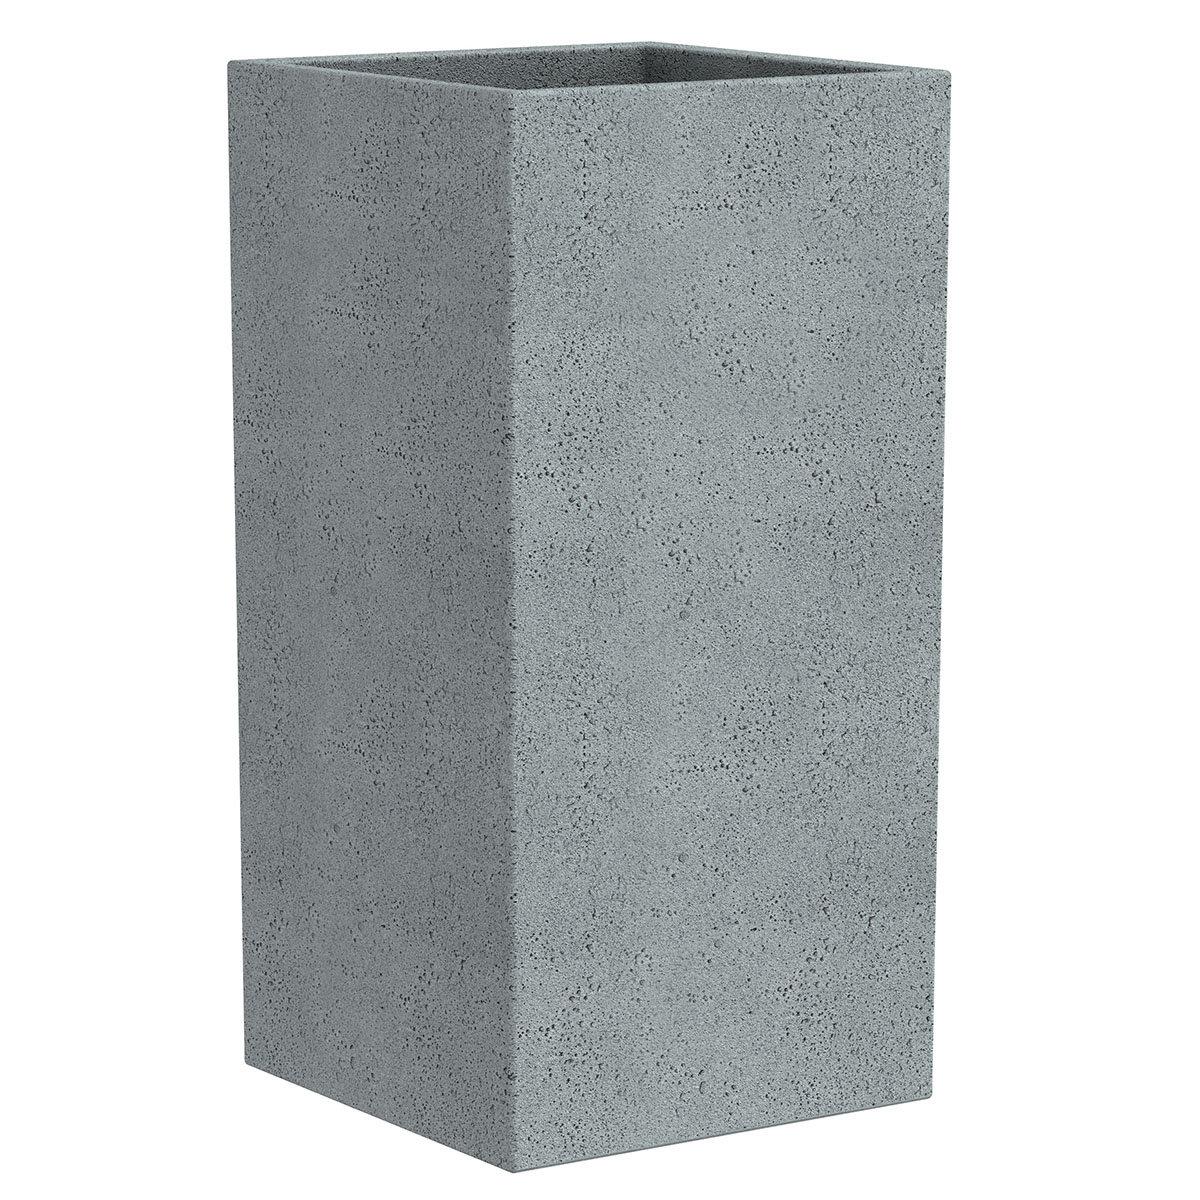 Pflanzkübel High Cube, 28x28x48 cm, Stony Grey